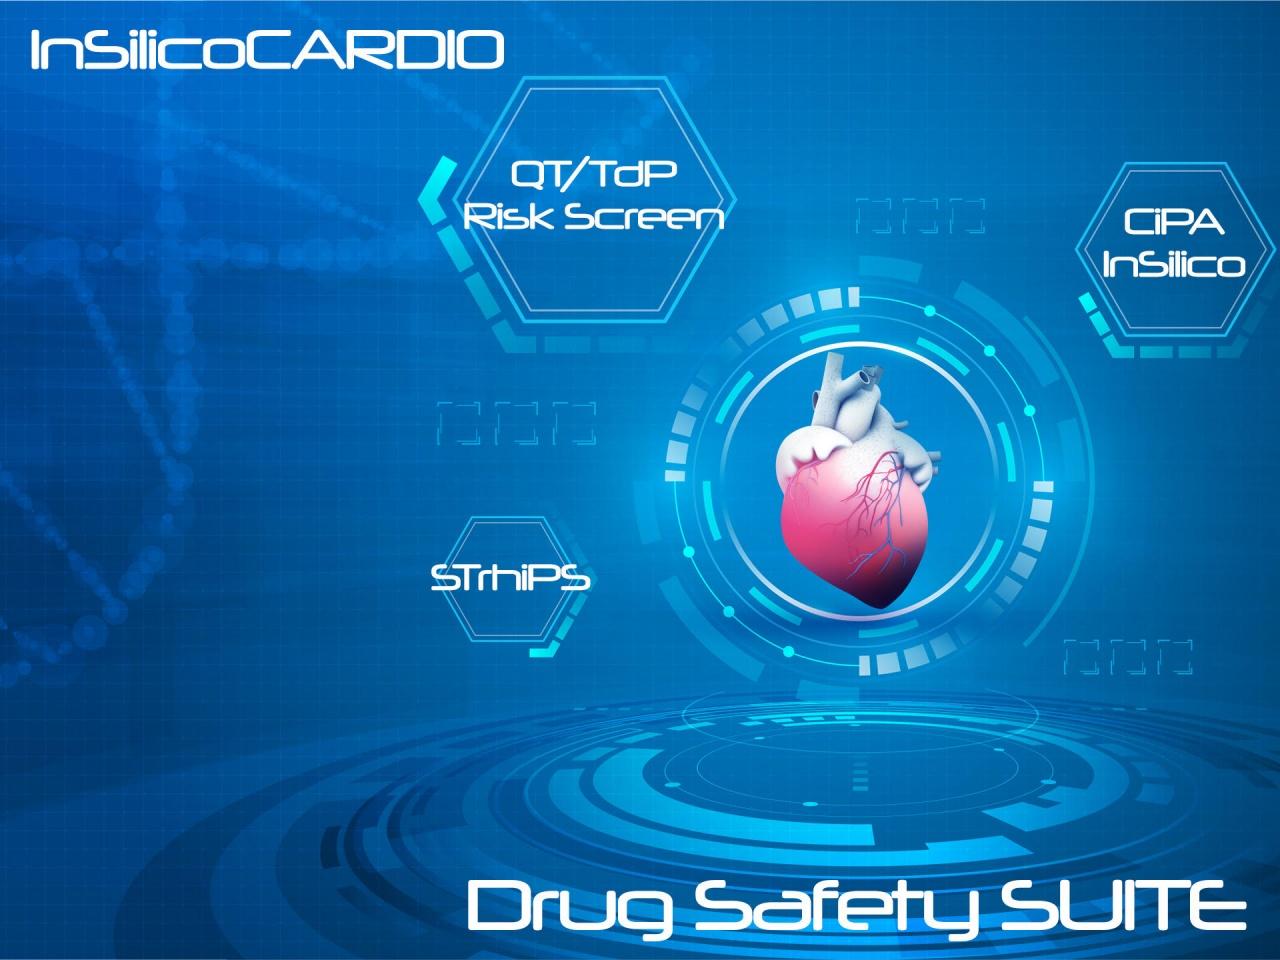 ist drug safety suite 1